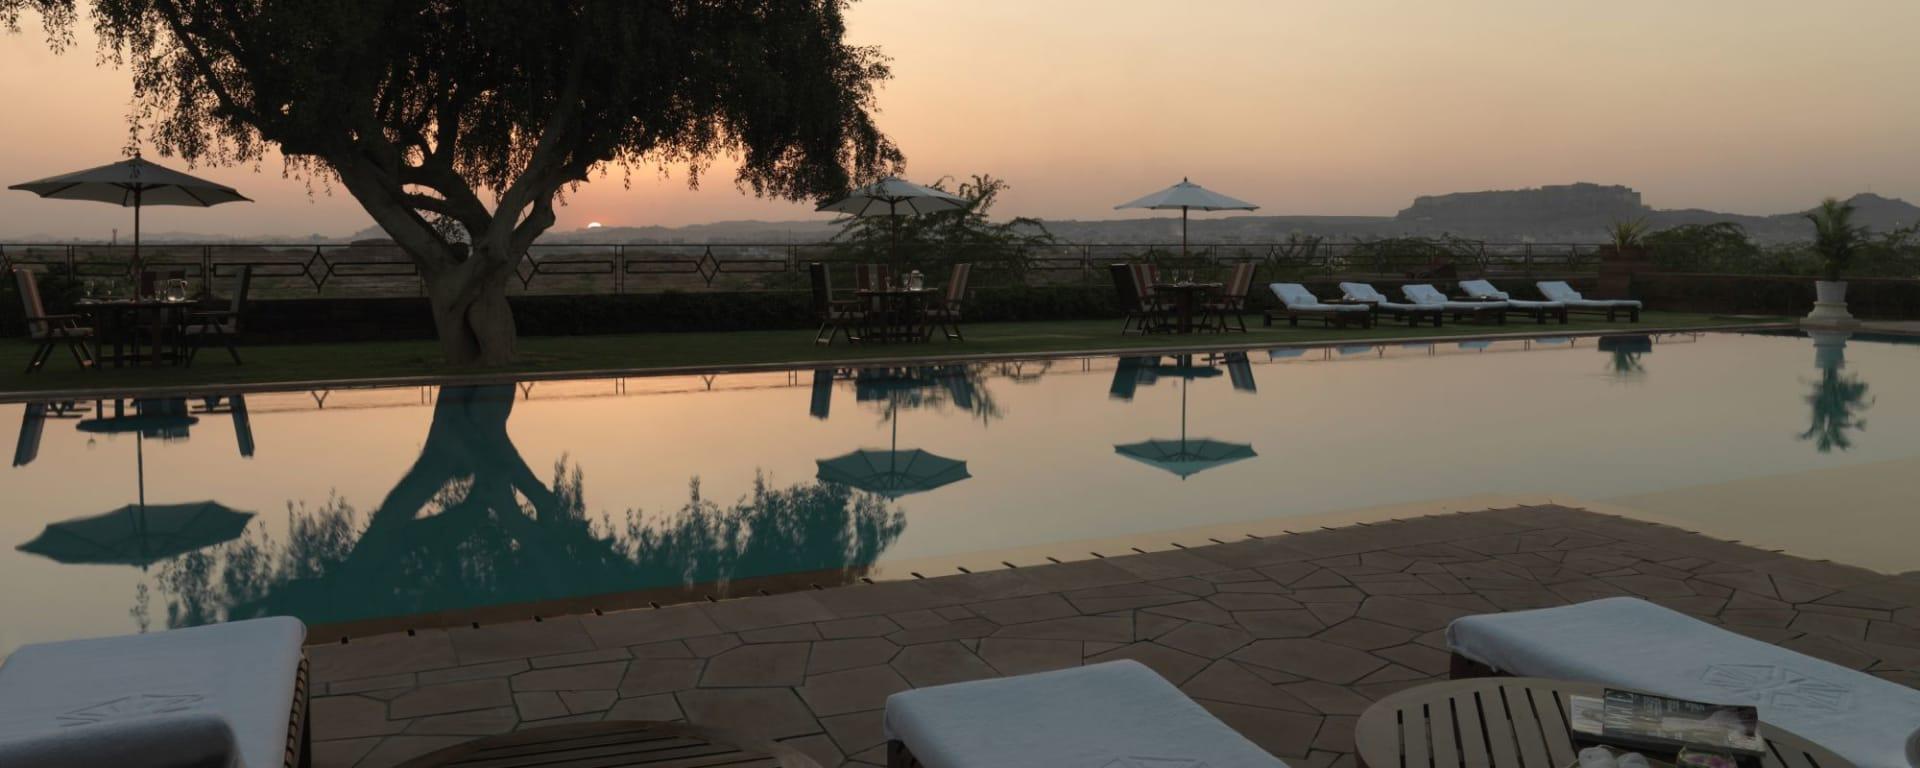 Umaid Bhawan Palace à Jodhpur: Swimmingpool